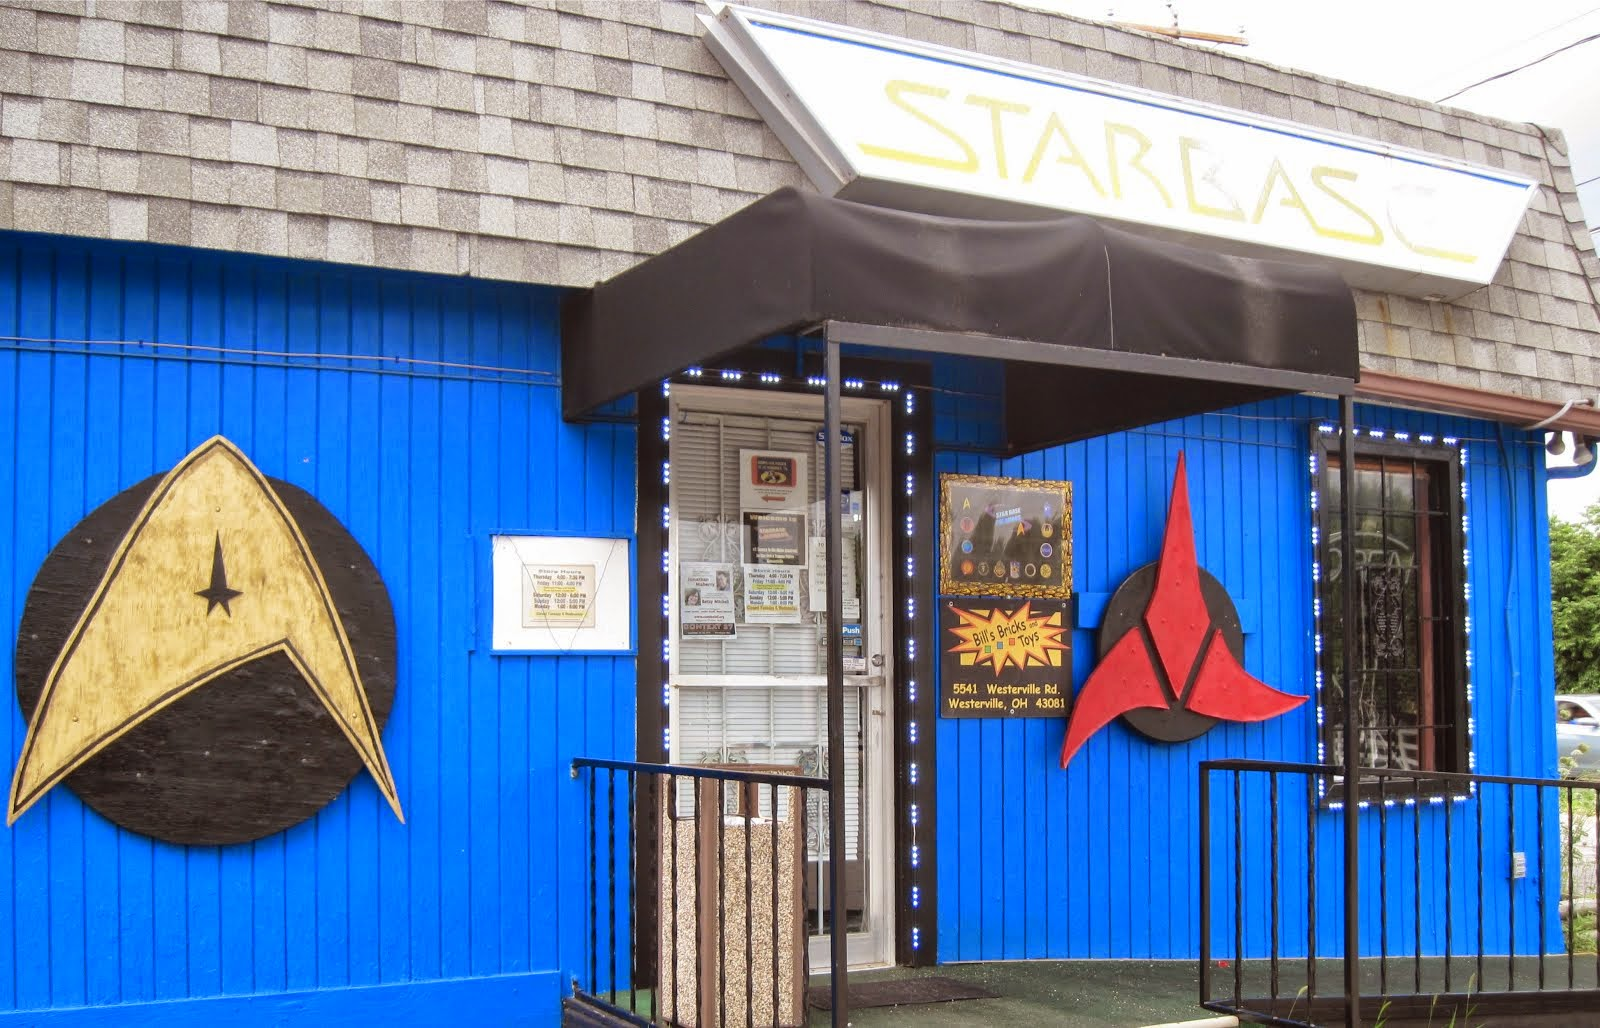 Star Base Columbus & Bills Bricks